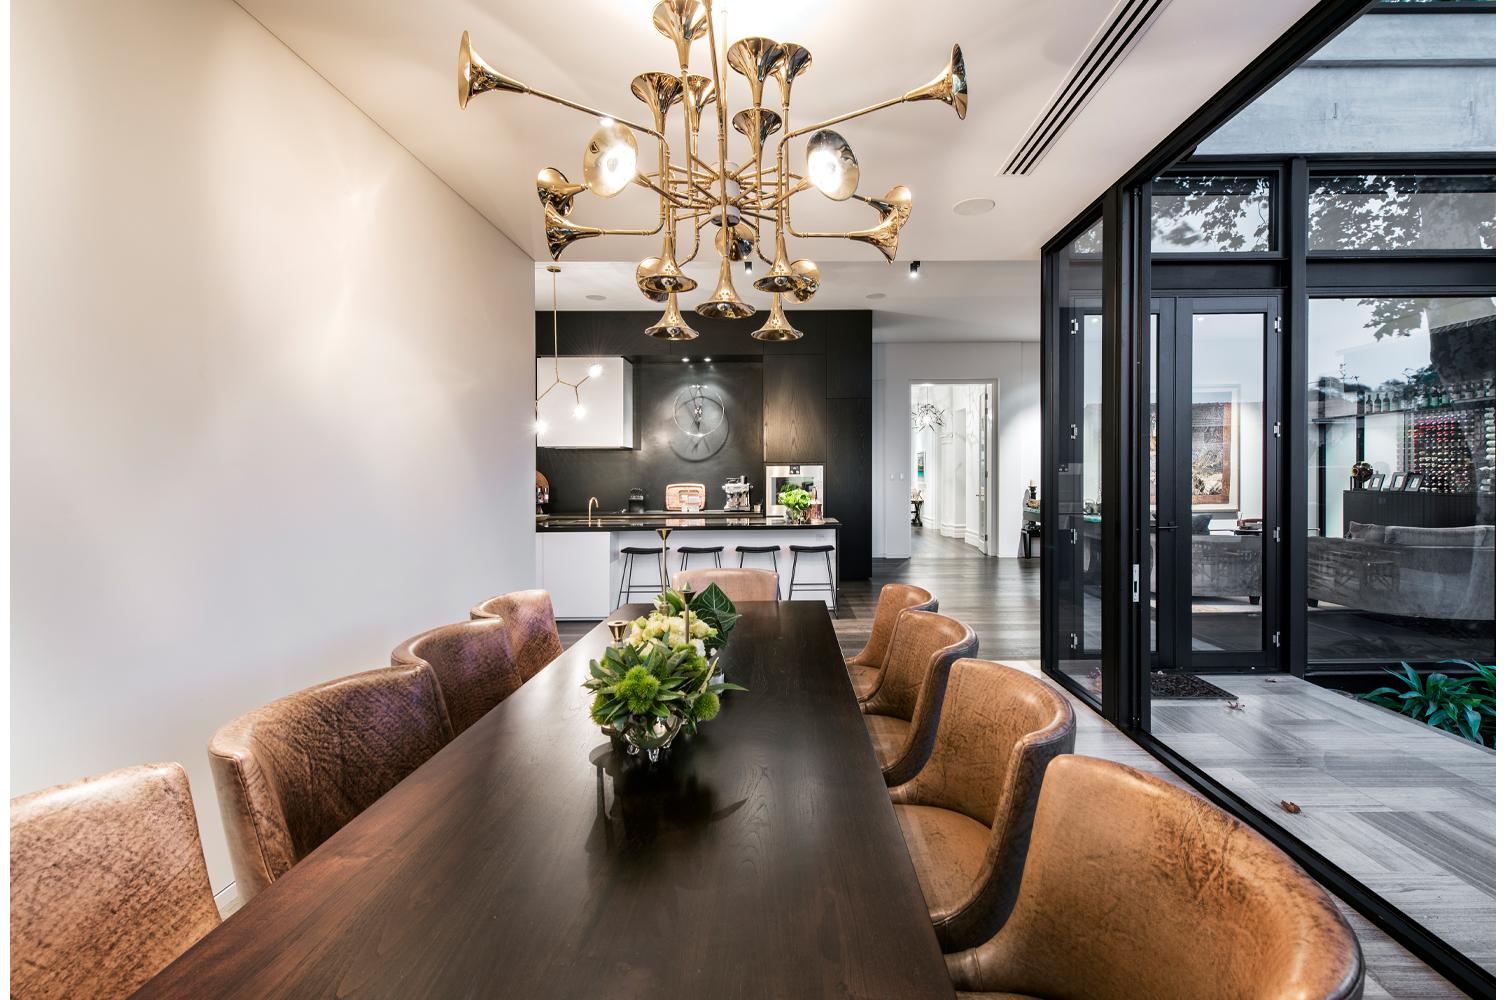 maek-luxury-home-design-inspiration-peppermintgrove-27v-diningroom-gallery-8.jpg